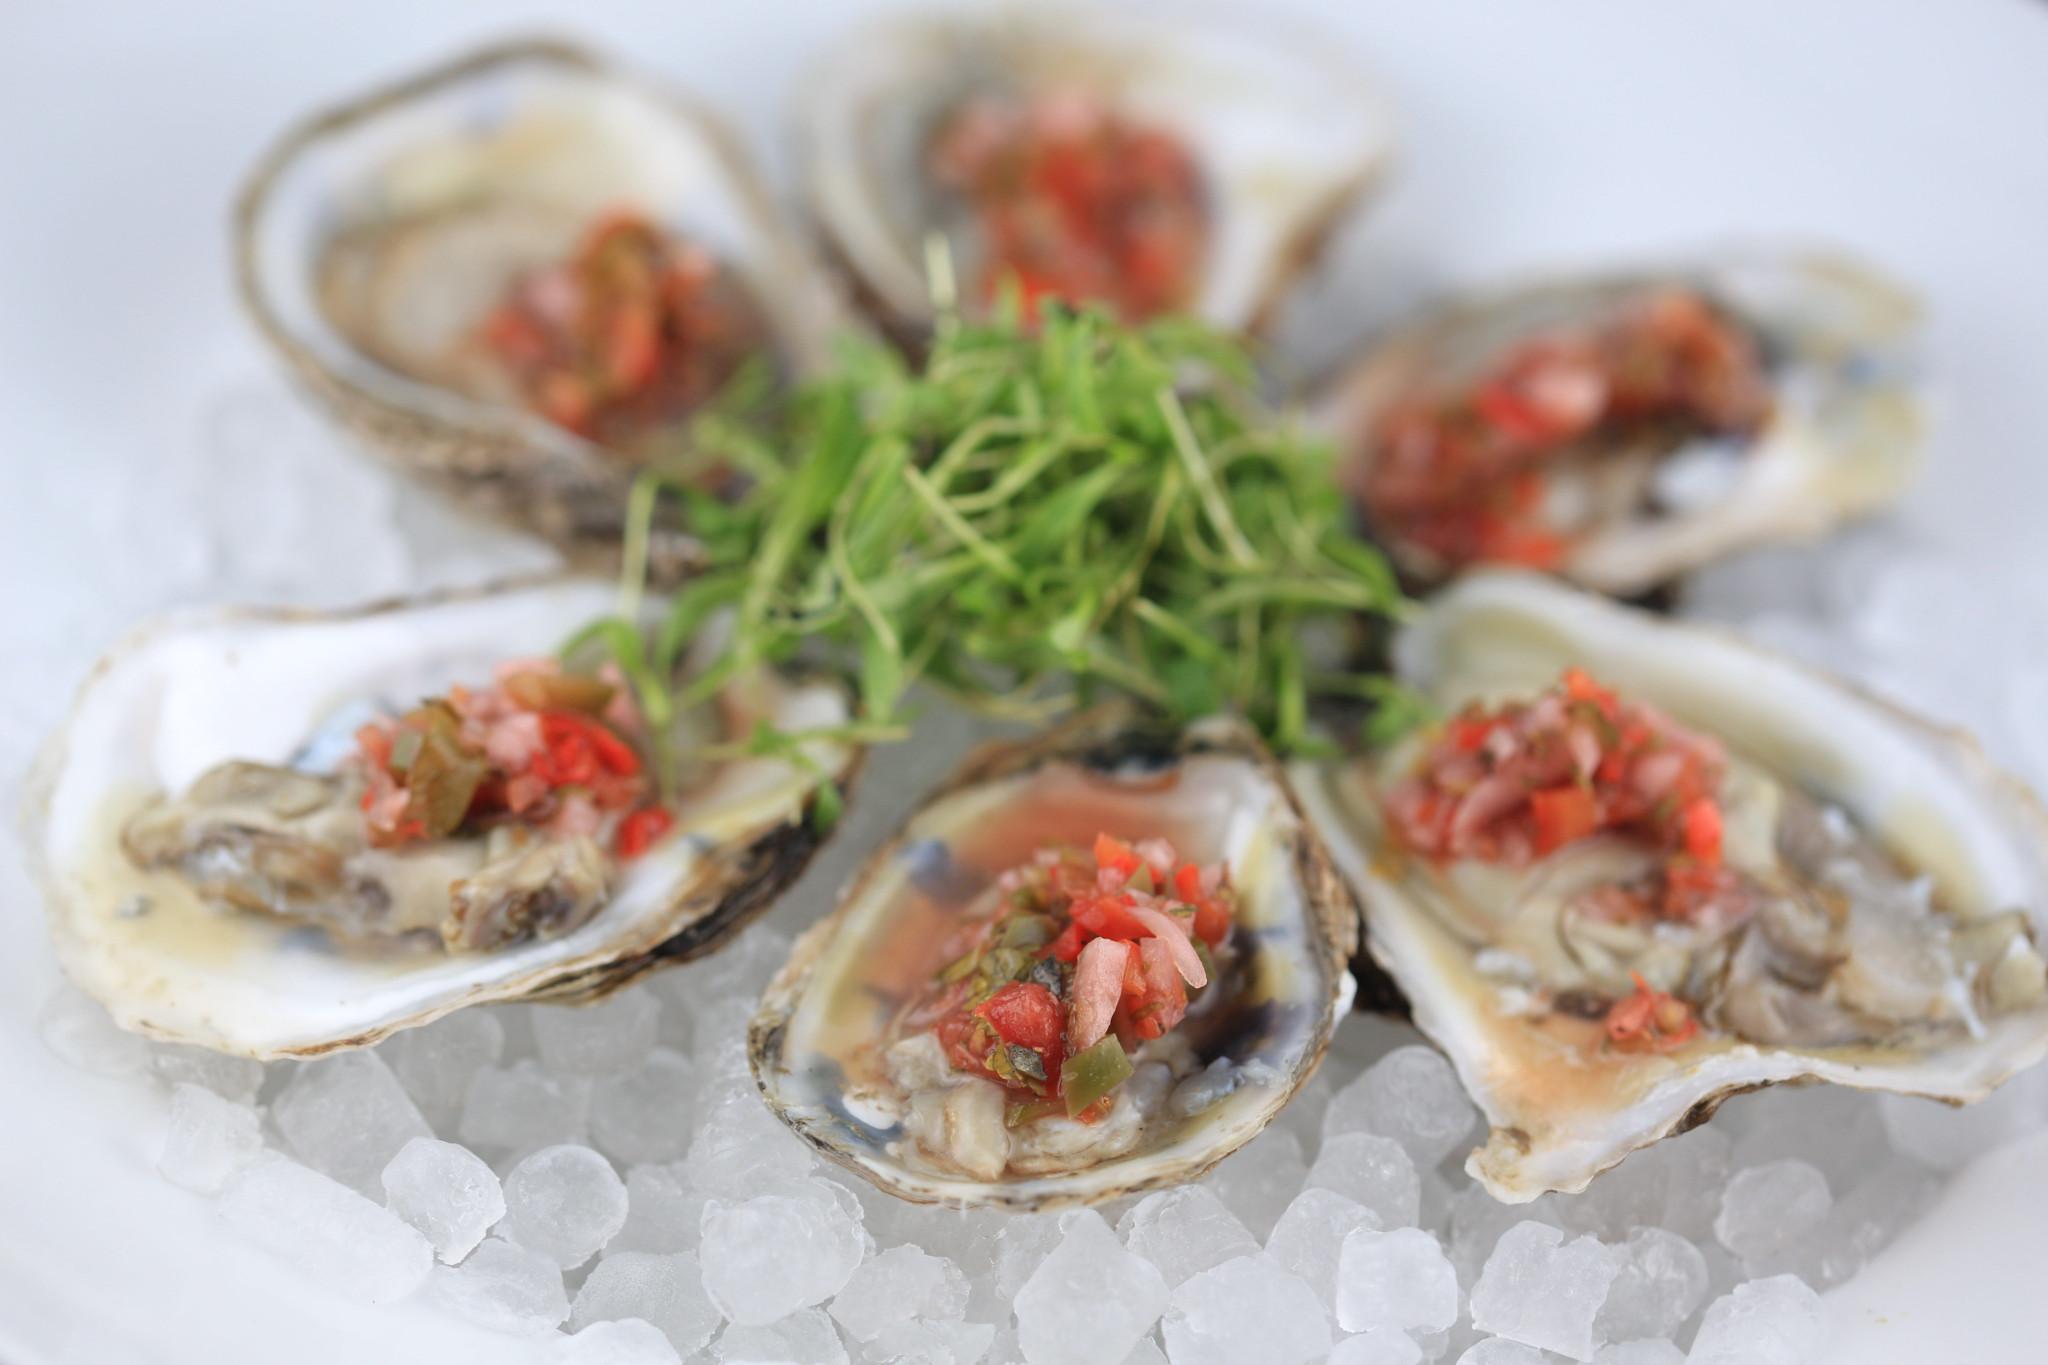 Oyster mignonette recipes